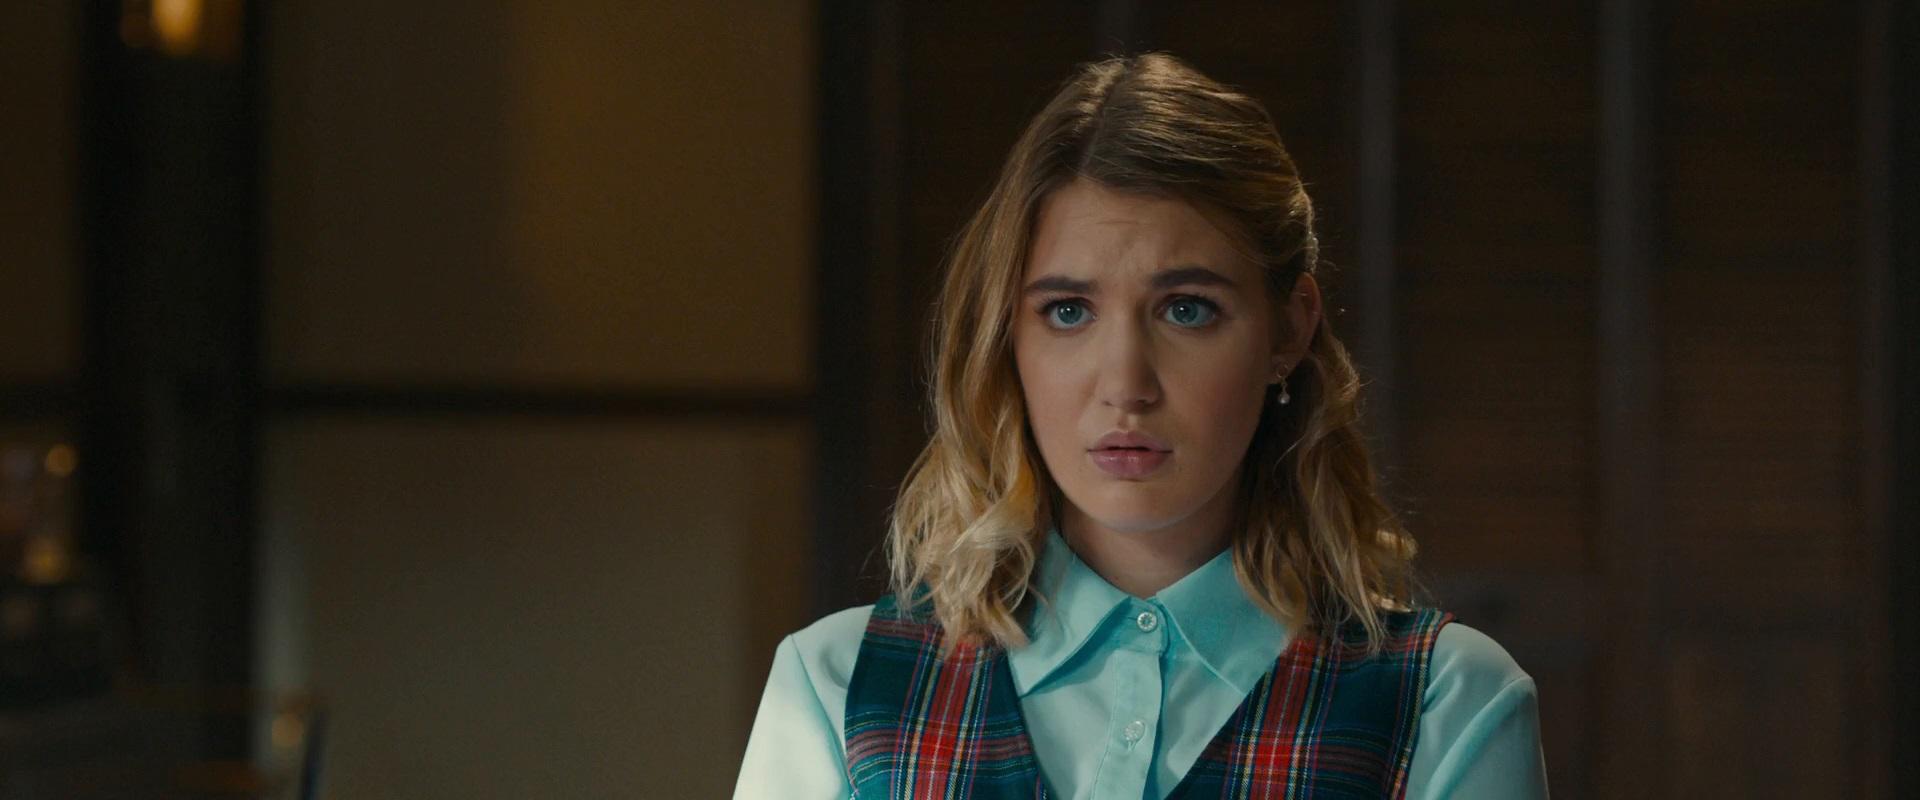 Sophie Nélisse in The Kid Detective (2020)